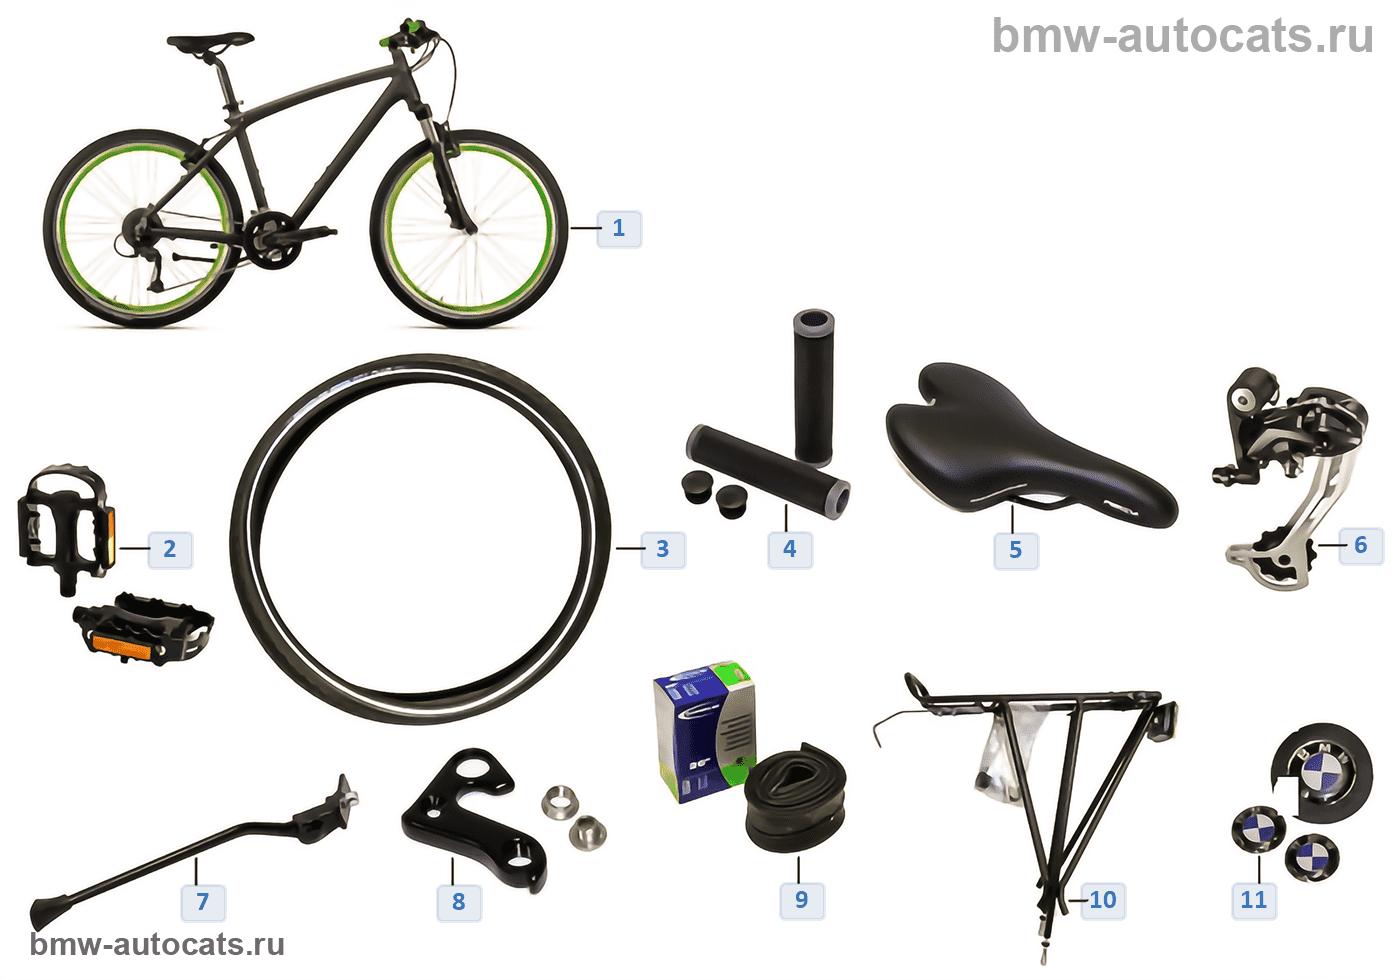 BMW Ersatzteile — Cruise Bike II